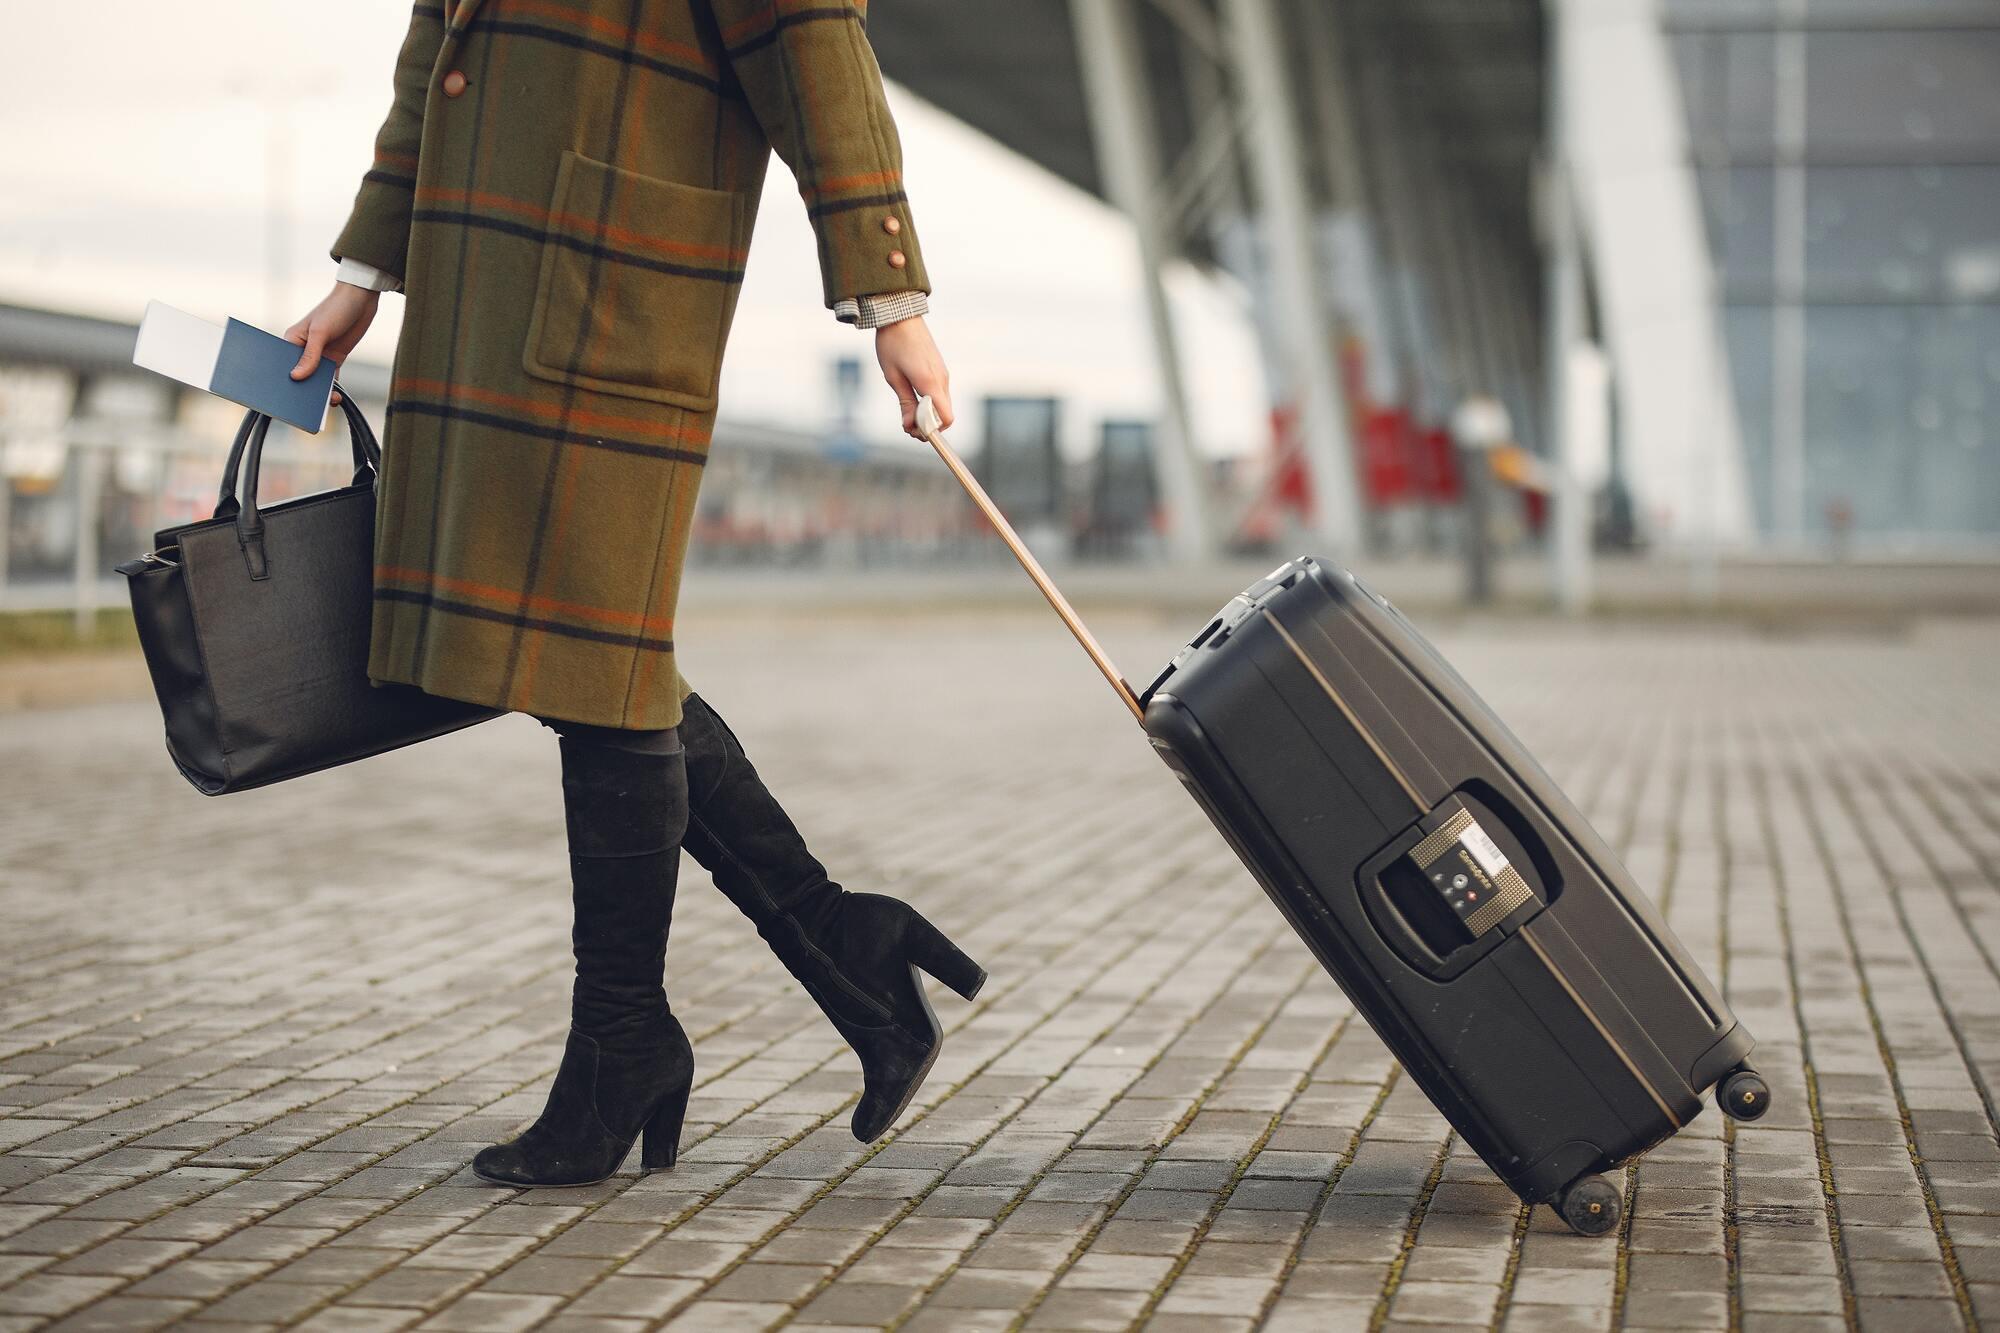 Turkish Airlines дозволяє перевозити одну ручну поклажу